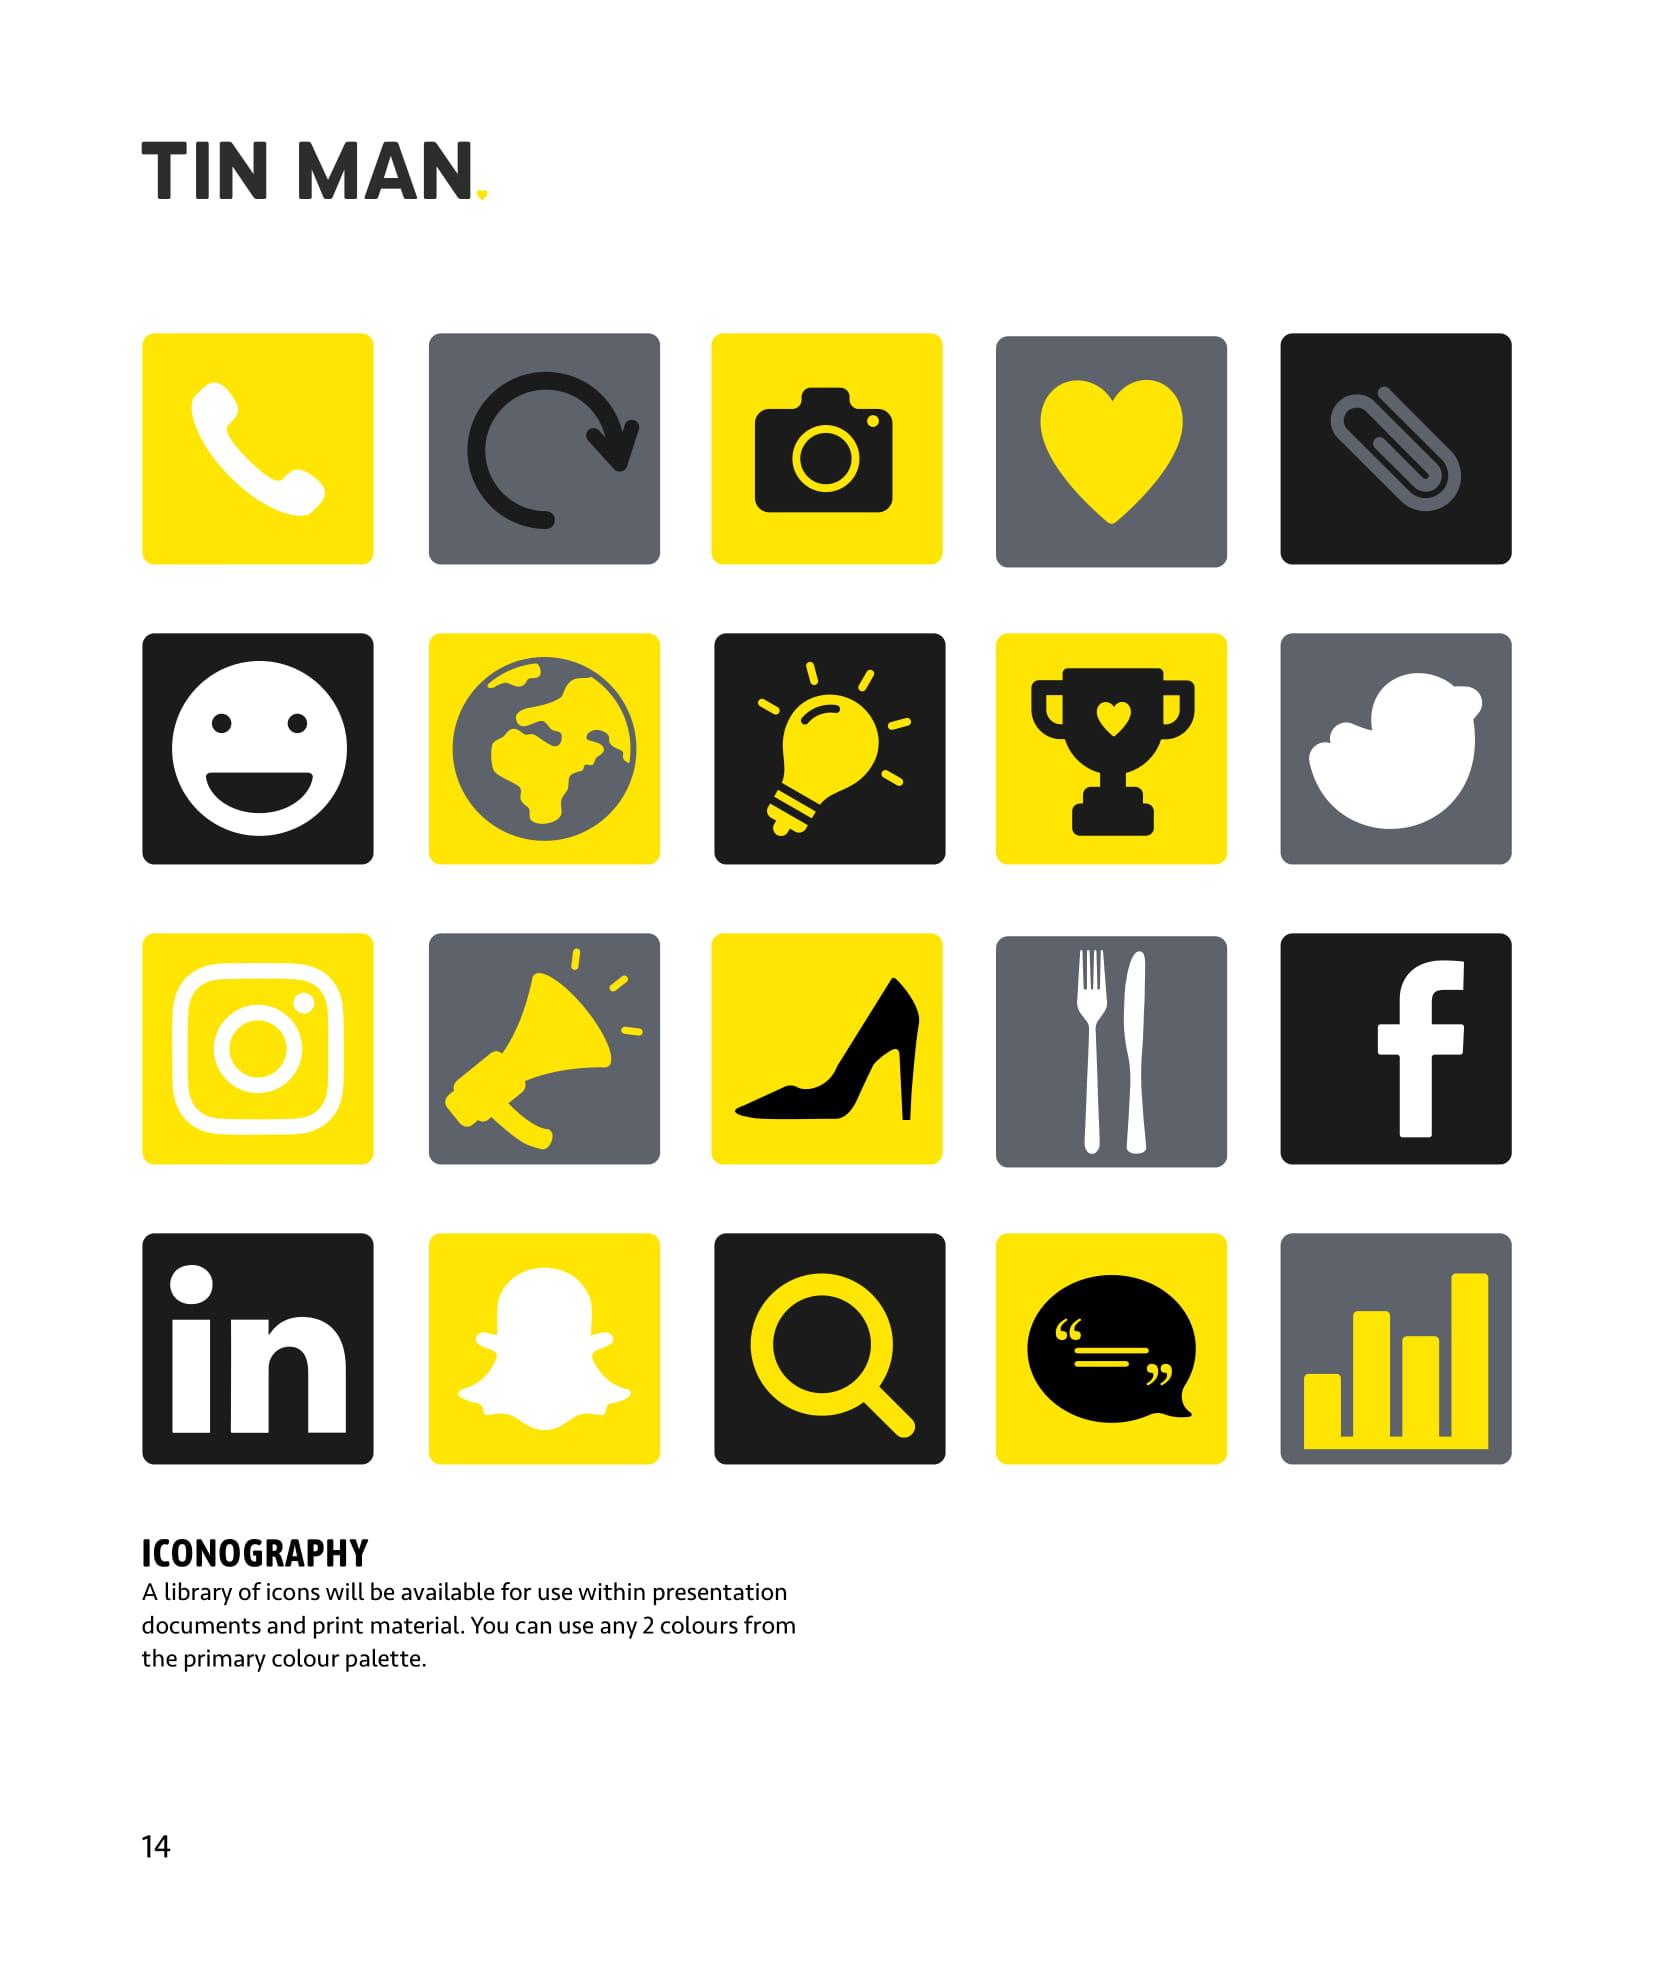 tinman_identityguidelines-14.jpg